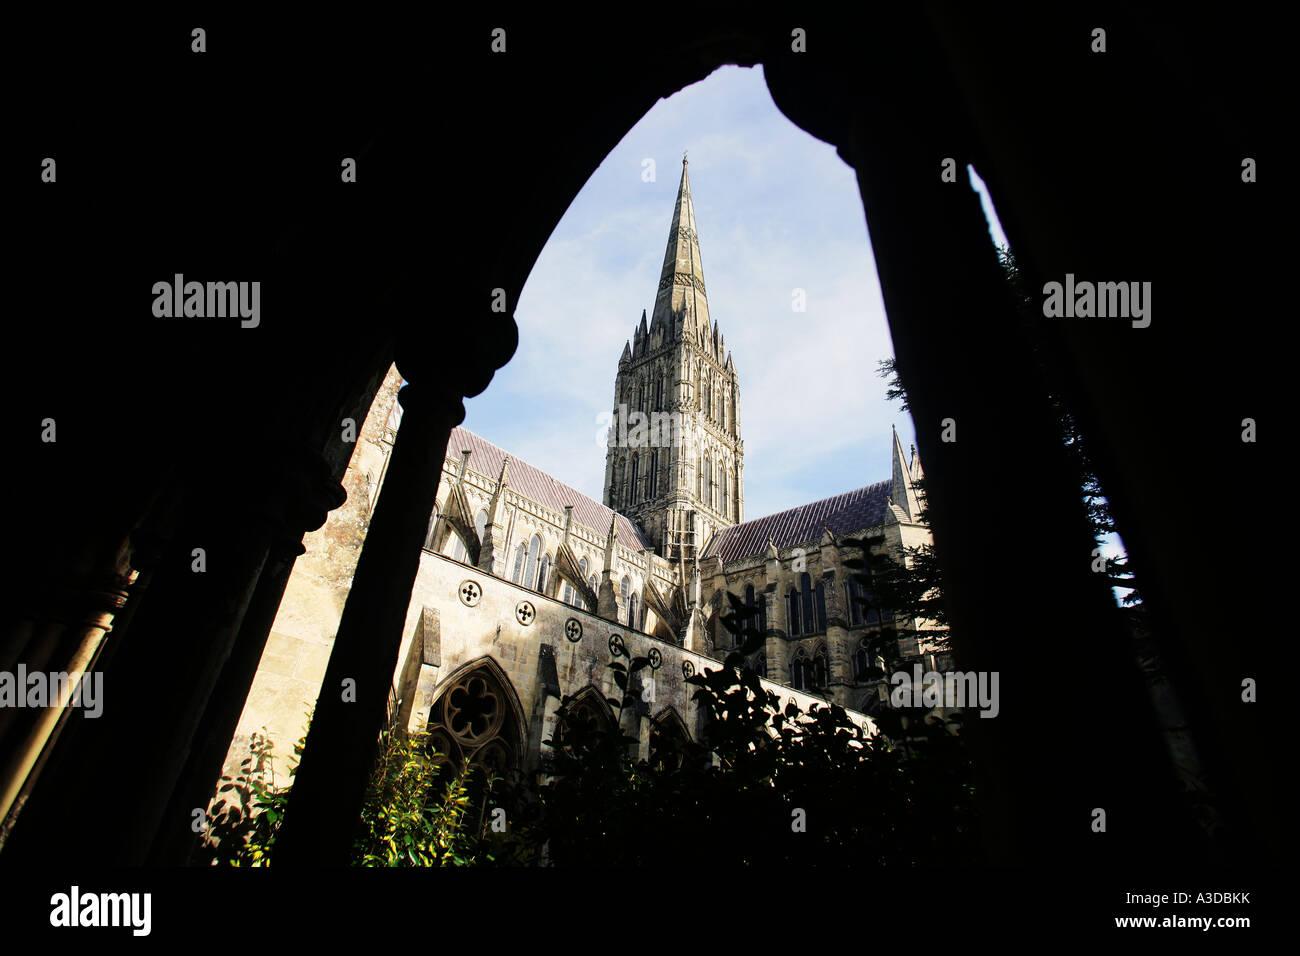 Salisbury cathedral - Stock Image